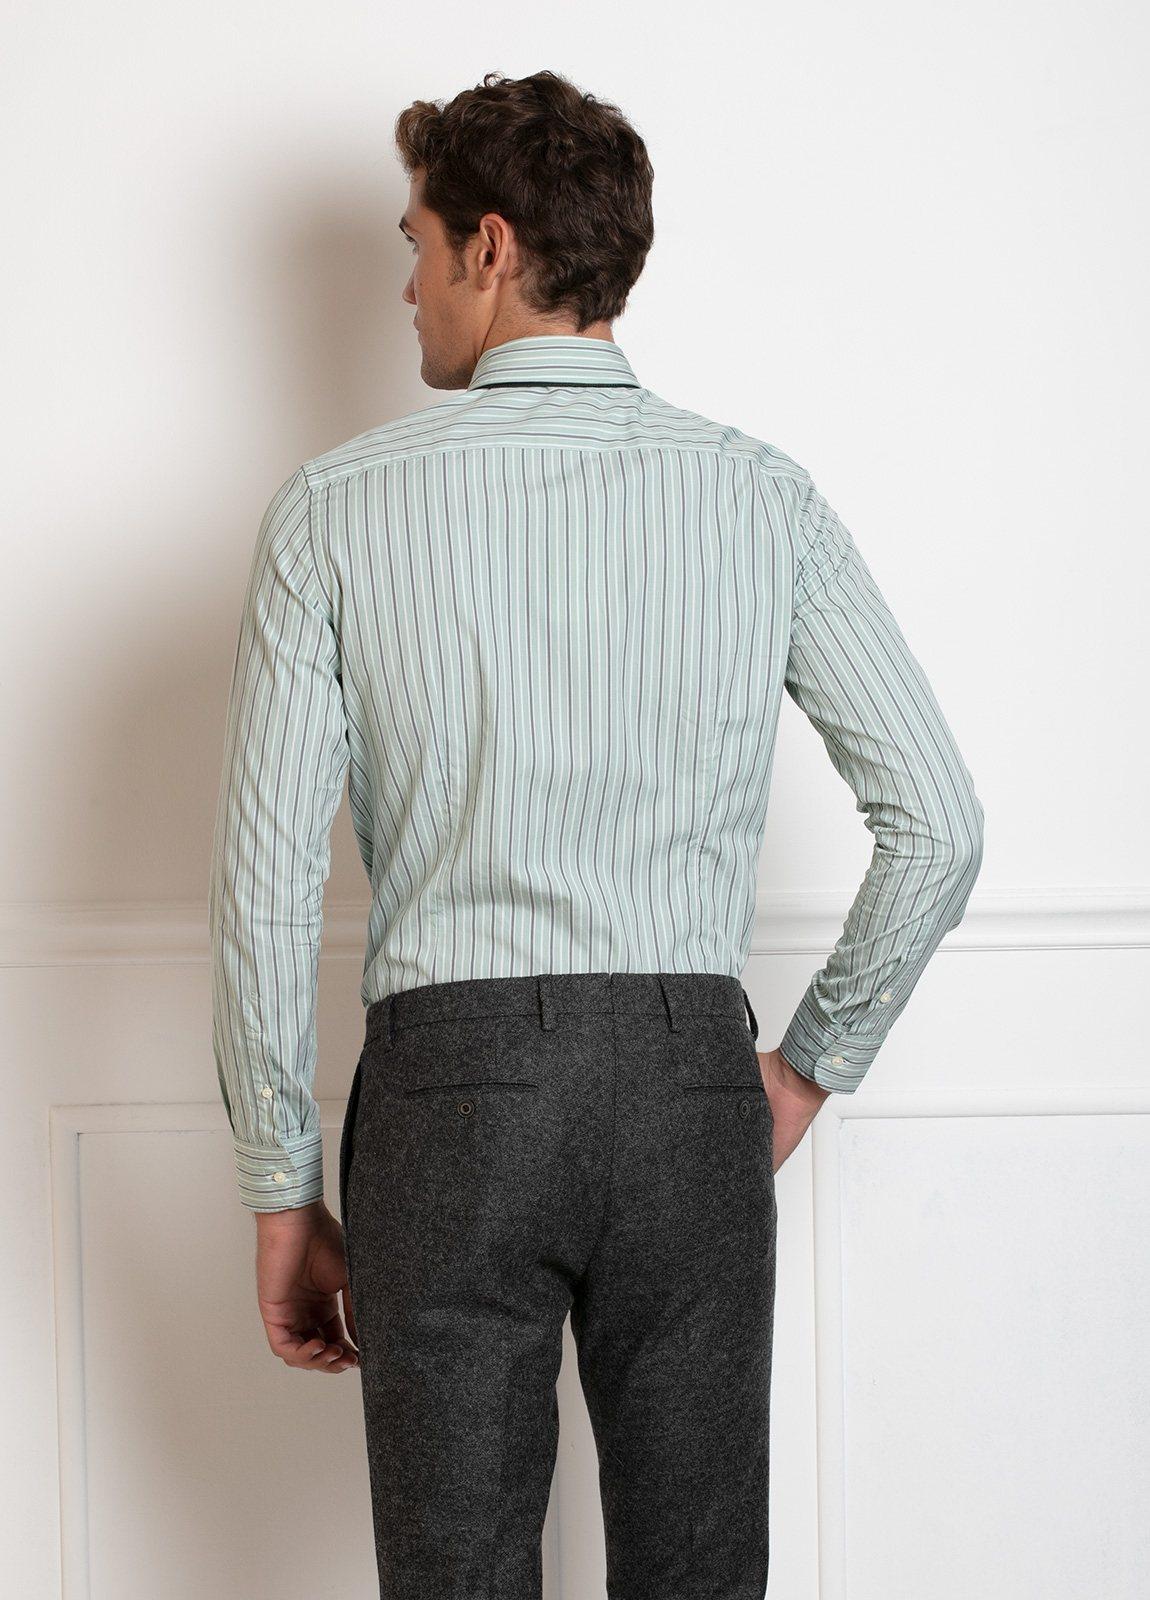 Camisa Leisure Wear SLIM FIT Modelo BOTTON DOWN color verde, estampado rayas gris. 100% Algodón. - Ítem3